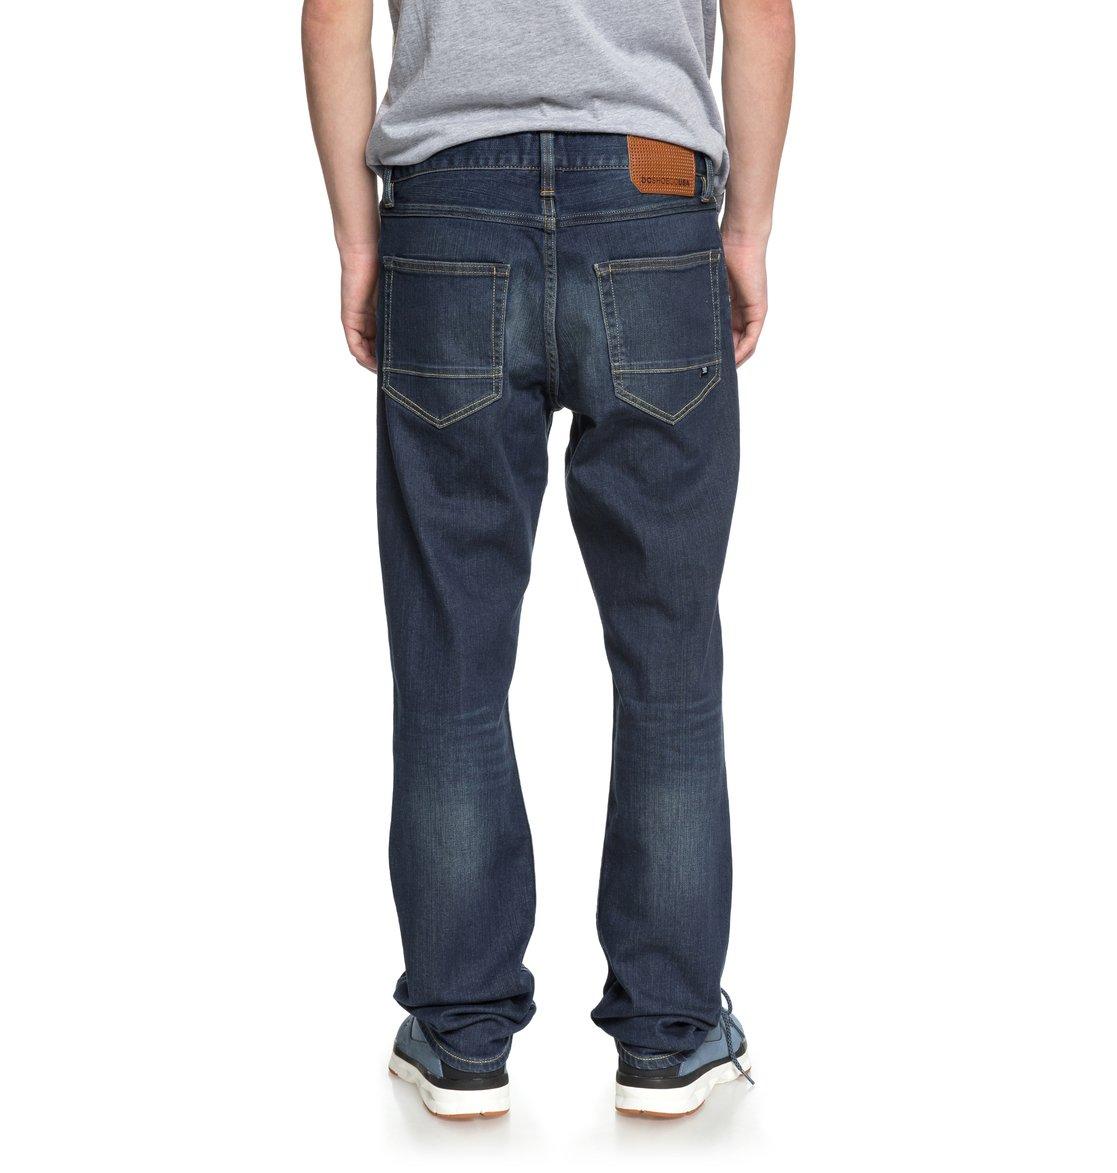 dc shoes Worker Medium Stone - Jeans Vestibilità Straight da Uomo - Blue - DC Shoes MC9YN